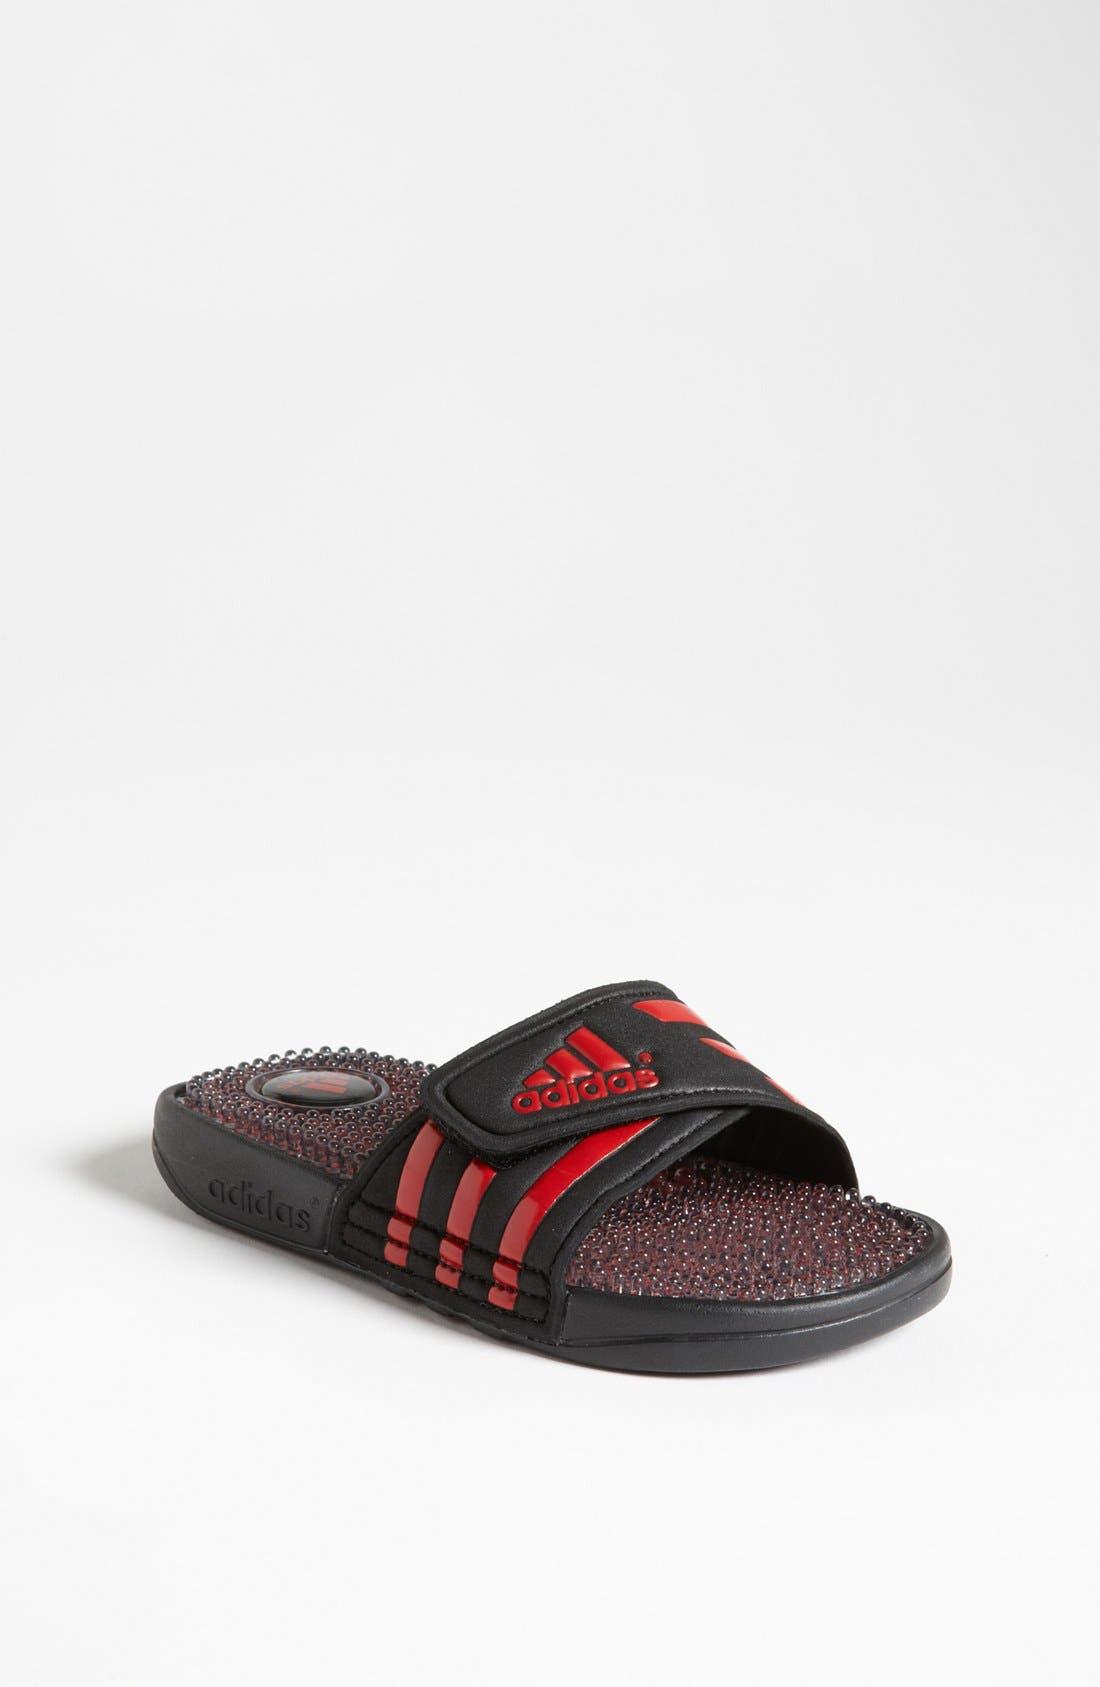 Alternate Image 1 Selected - adidas 'Adissage - Fade' Sandal (Toddler, Little Kid & Big Kid)